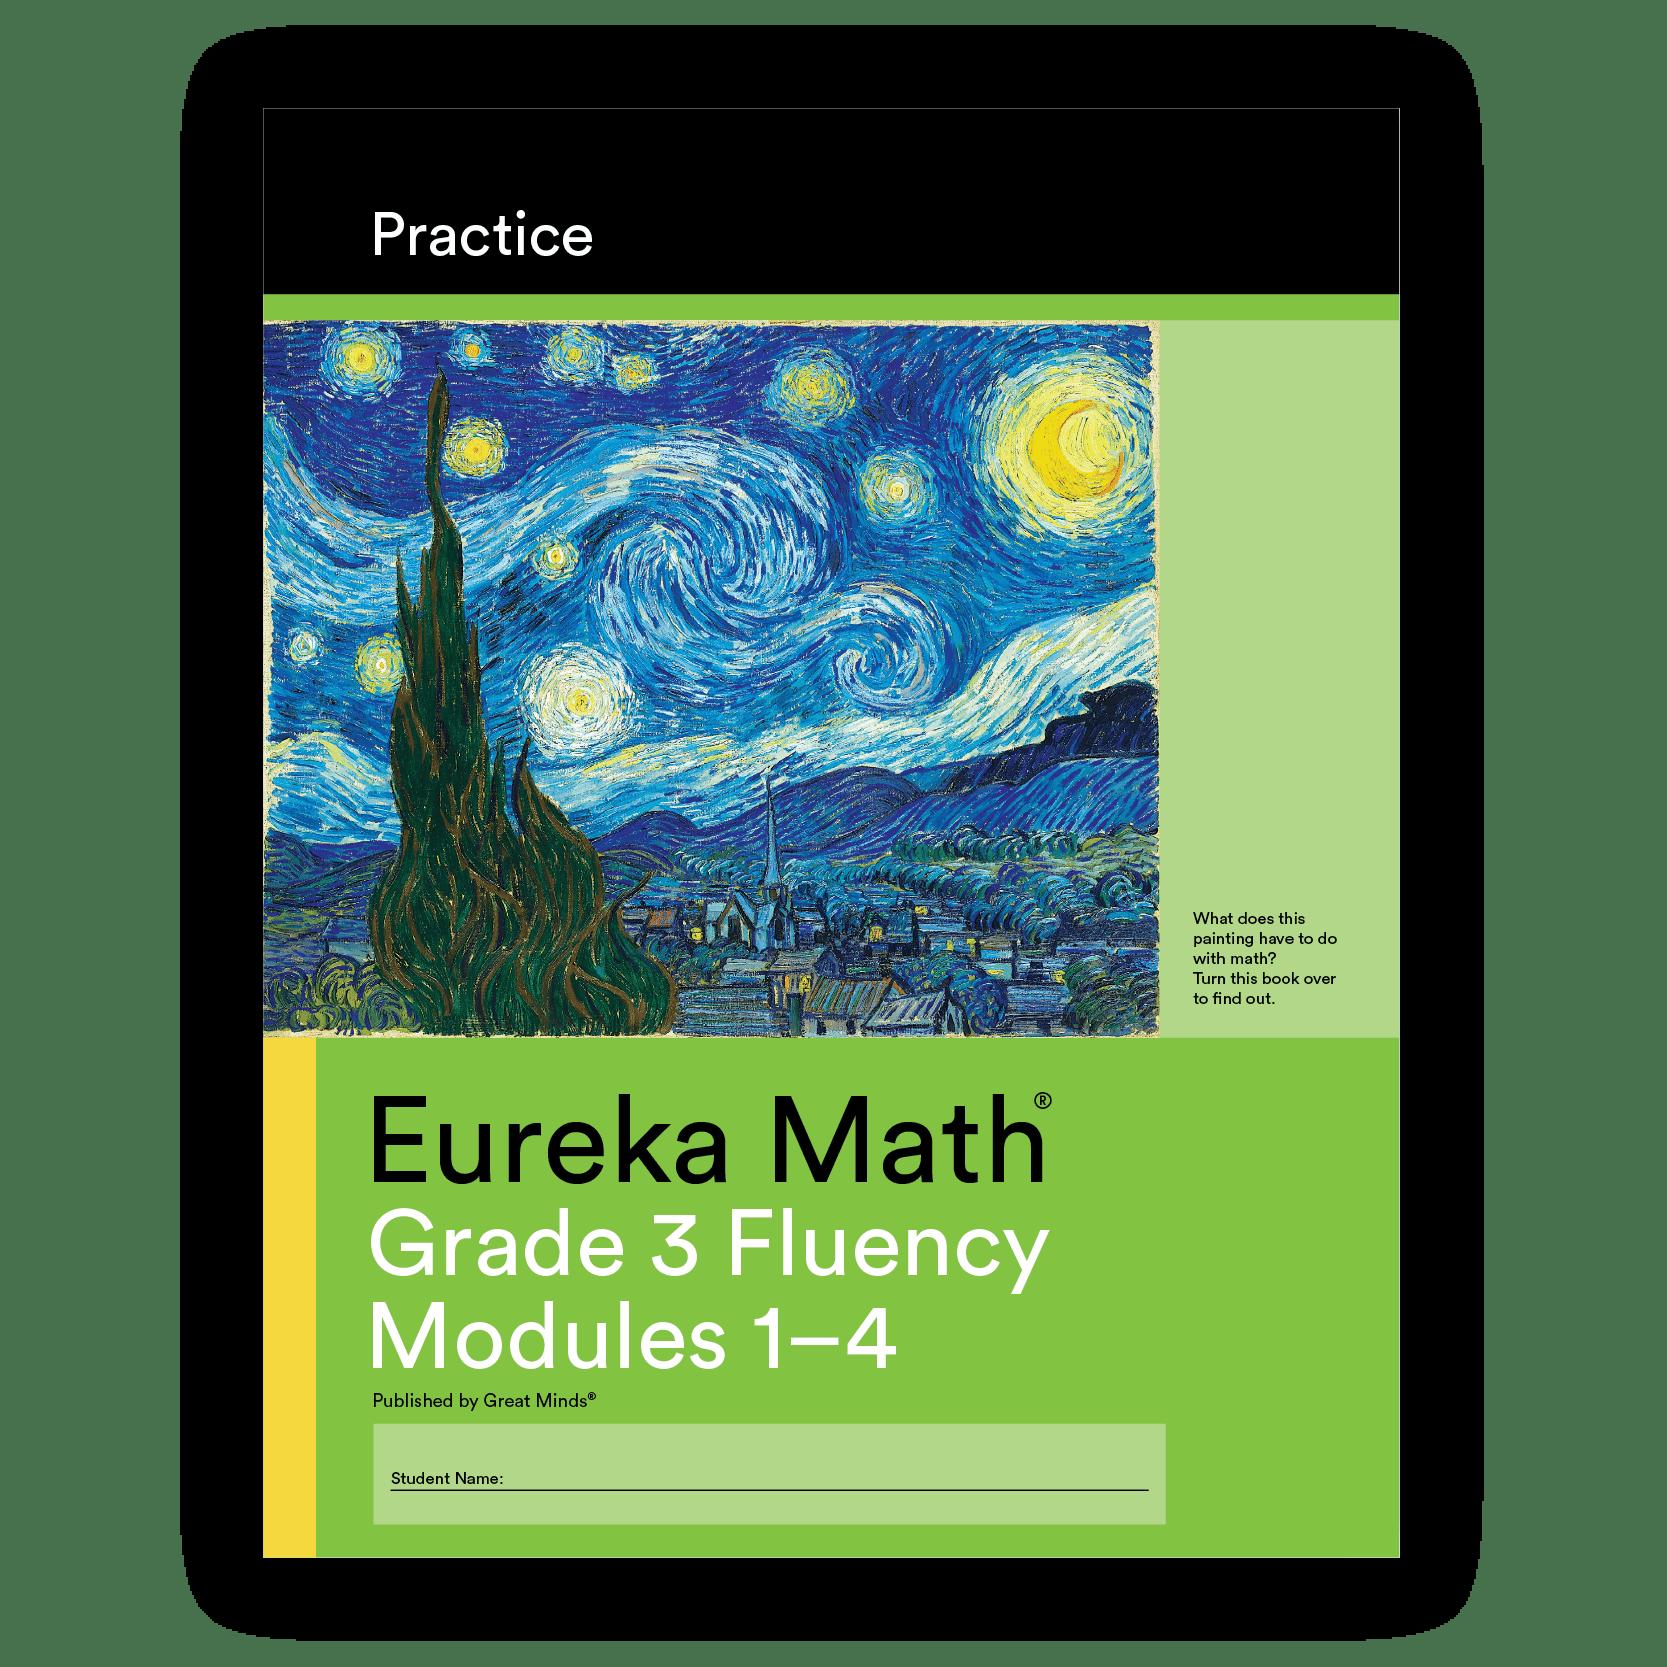 Eureka-Math-LPS-Practice-Sample